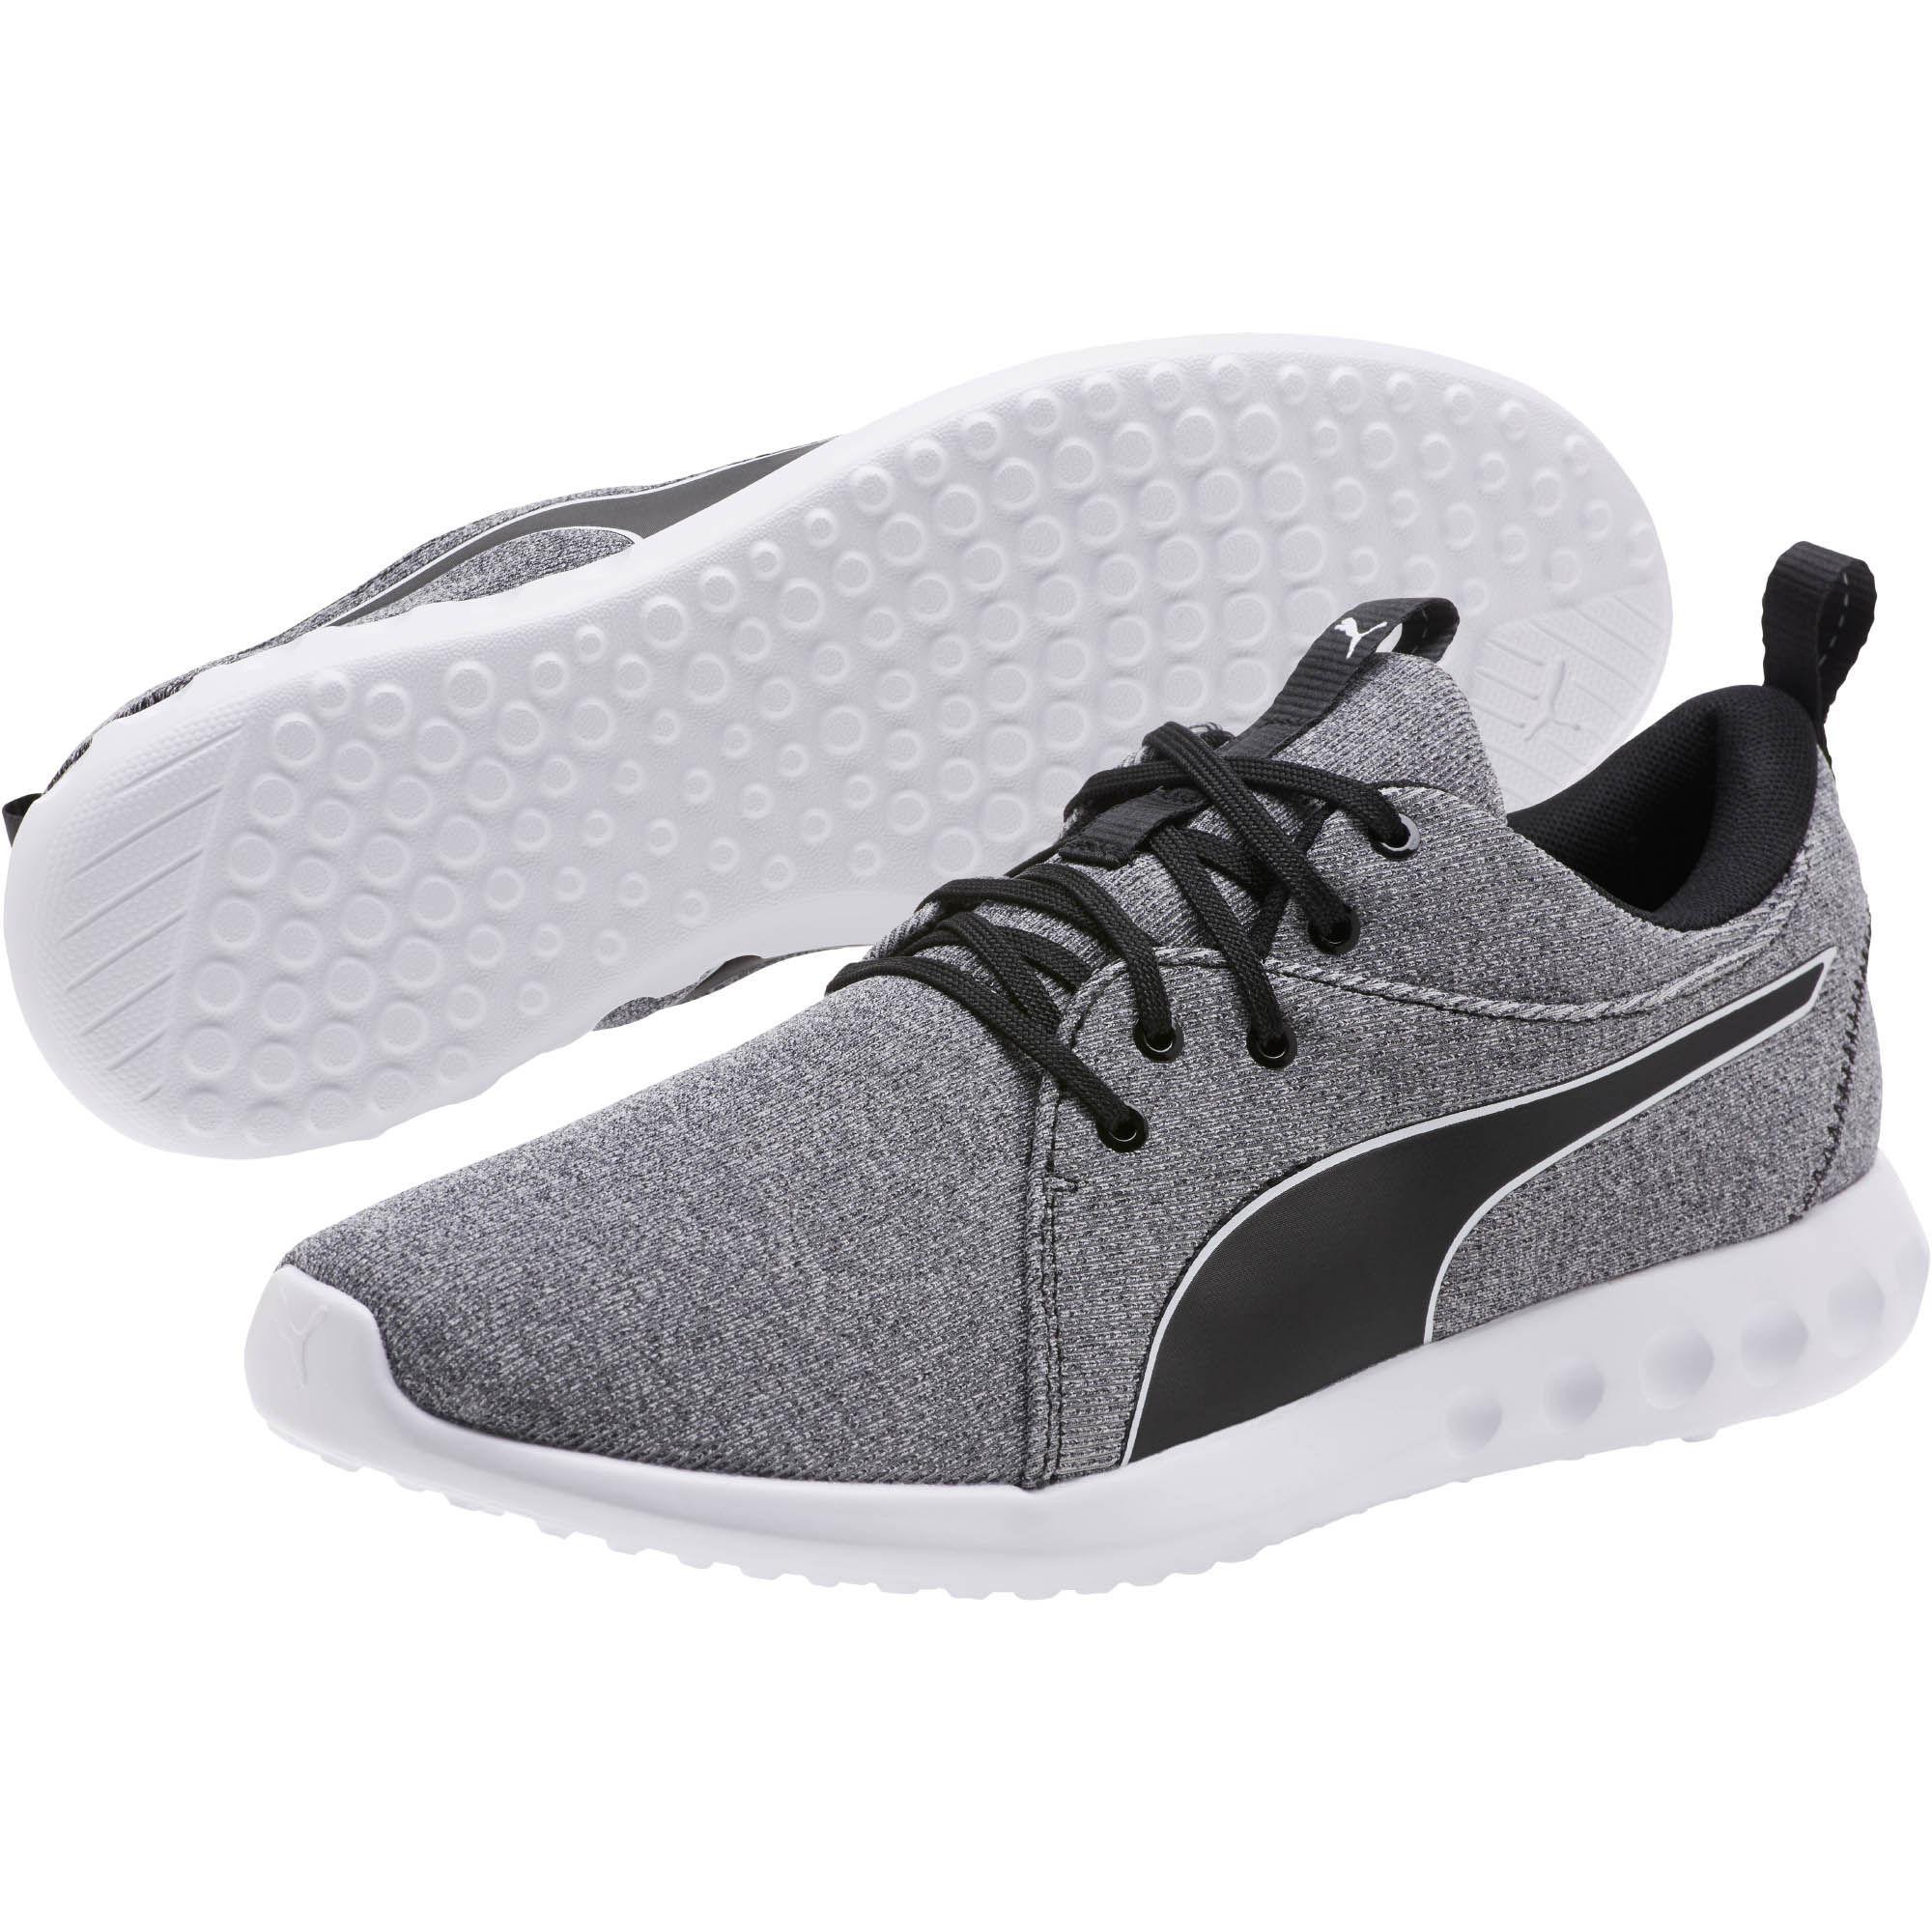 Lyst - PUMA Carson 2 Men s Nautical Running Shoes in Black for Men 030776063